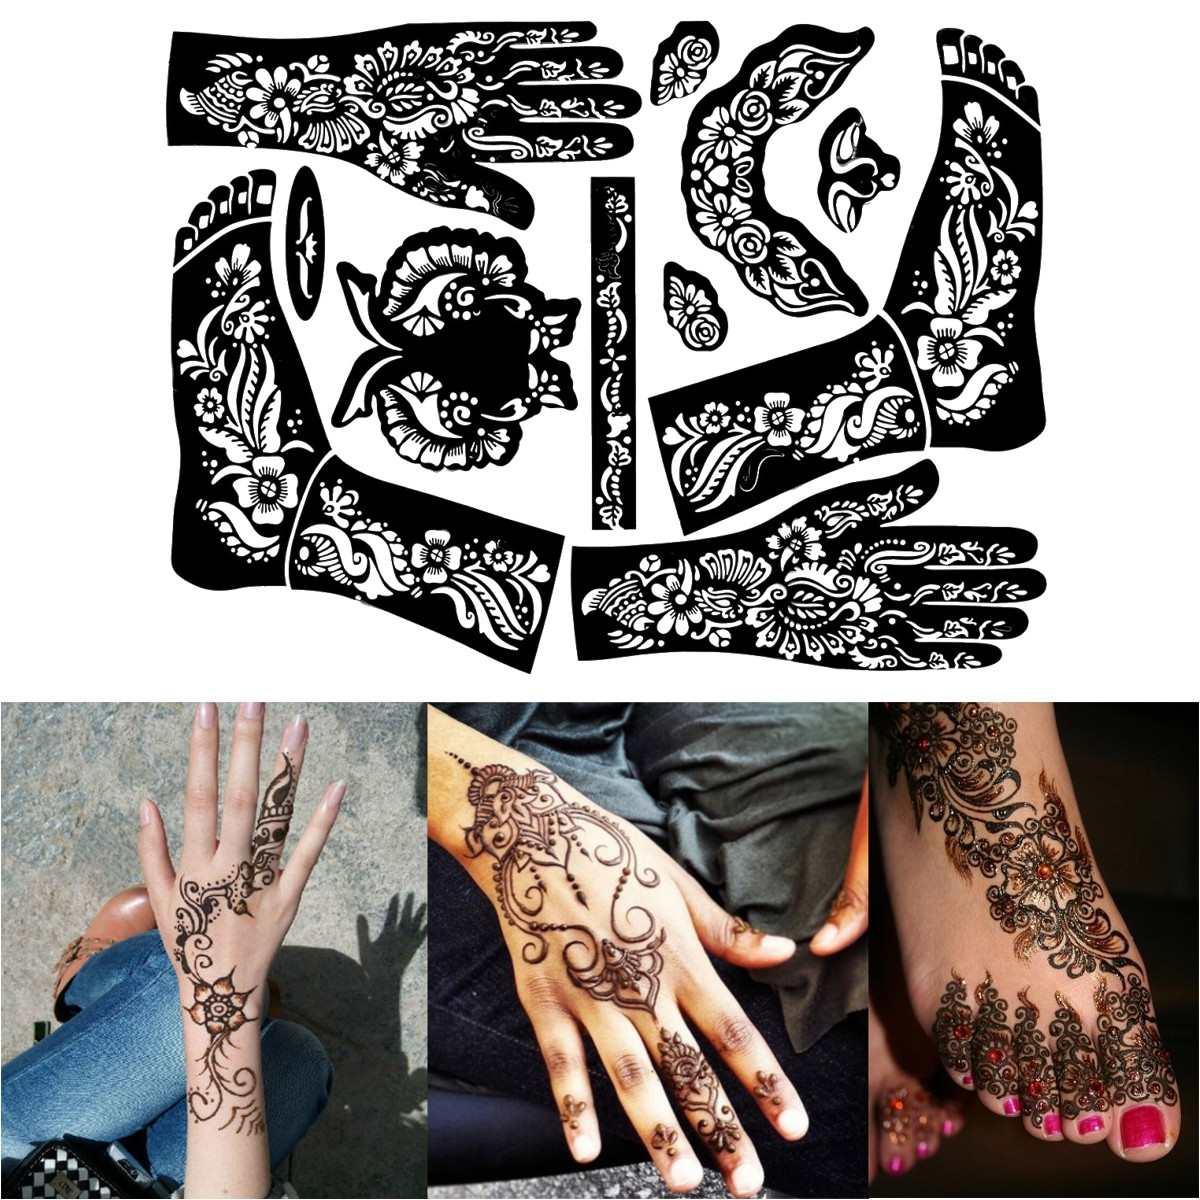 1 Sheet Henna Tattoo Templates Hands Feet Leg Arm Airbrushing Tattooing Templates Professional Temporary Mehndi Body Painting